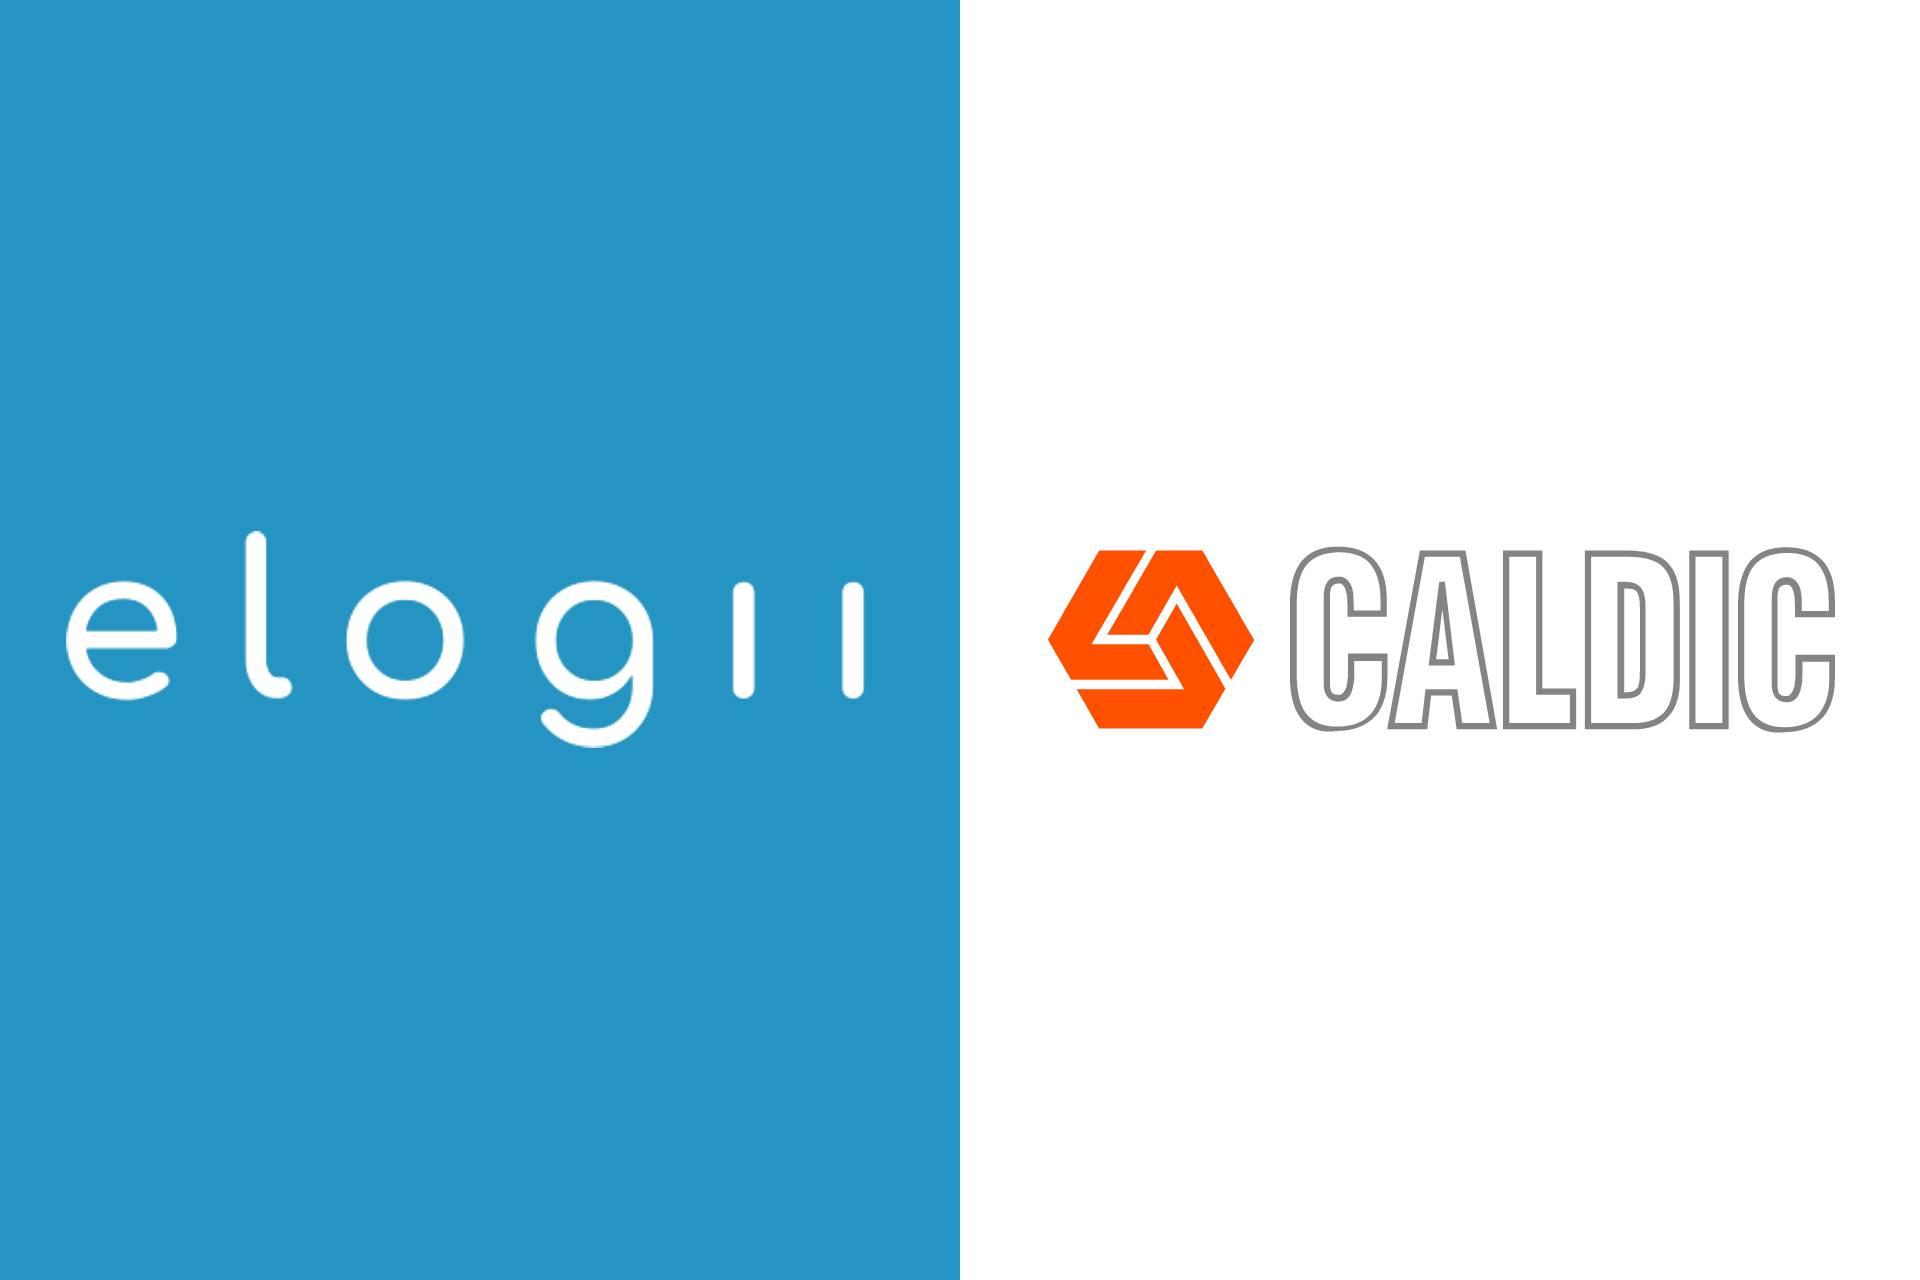 Caldic North America Chooses eLogii, the Leading Delivery Management Platform